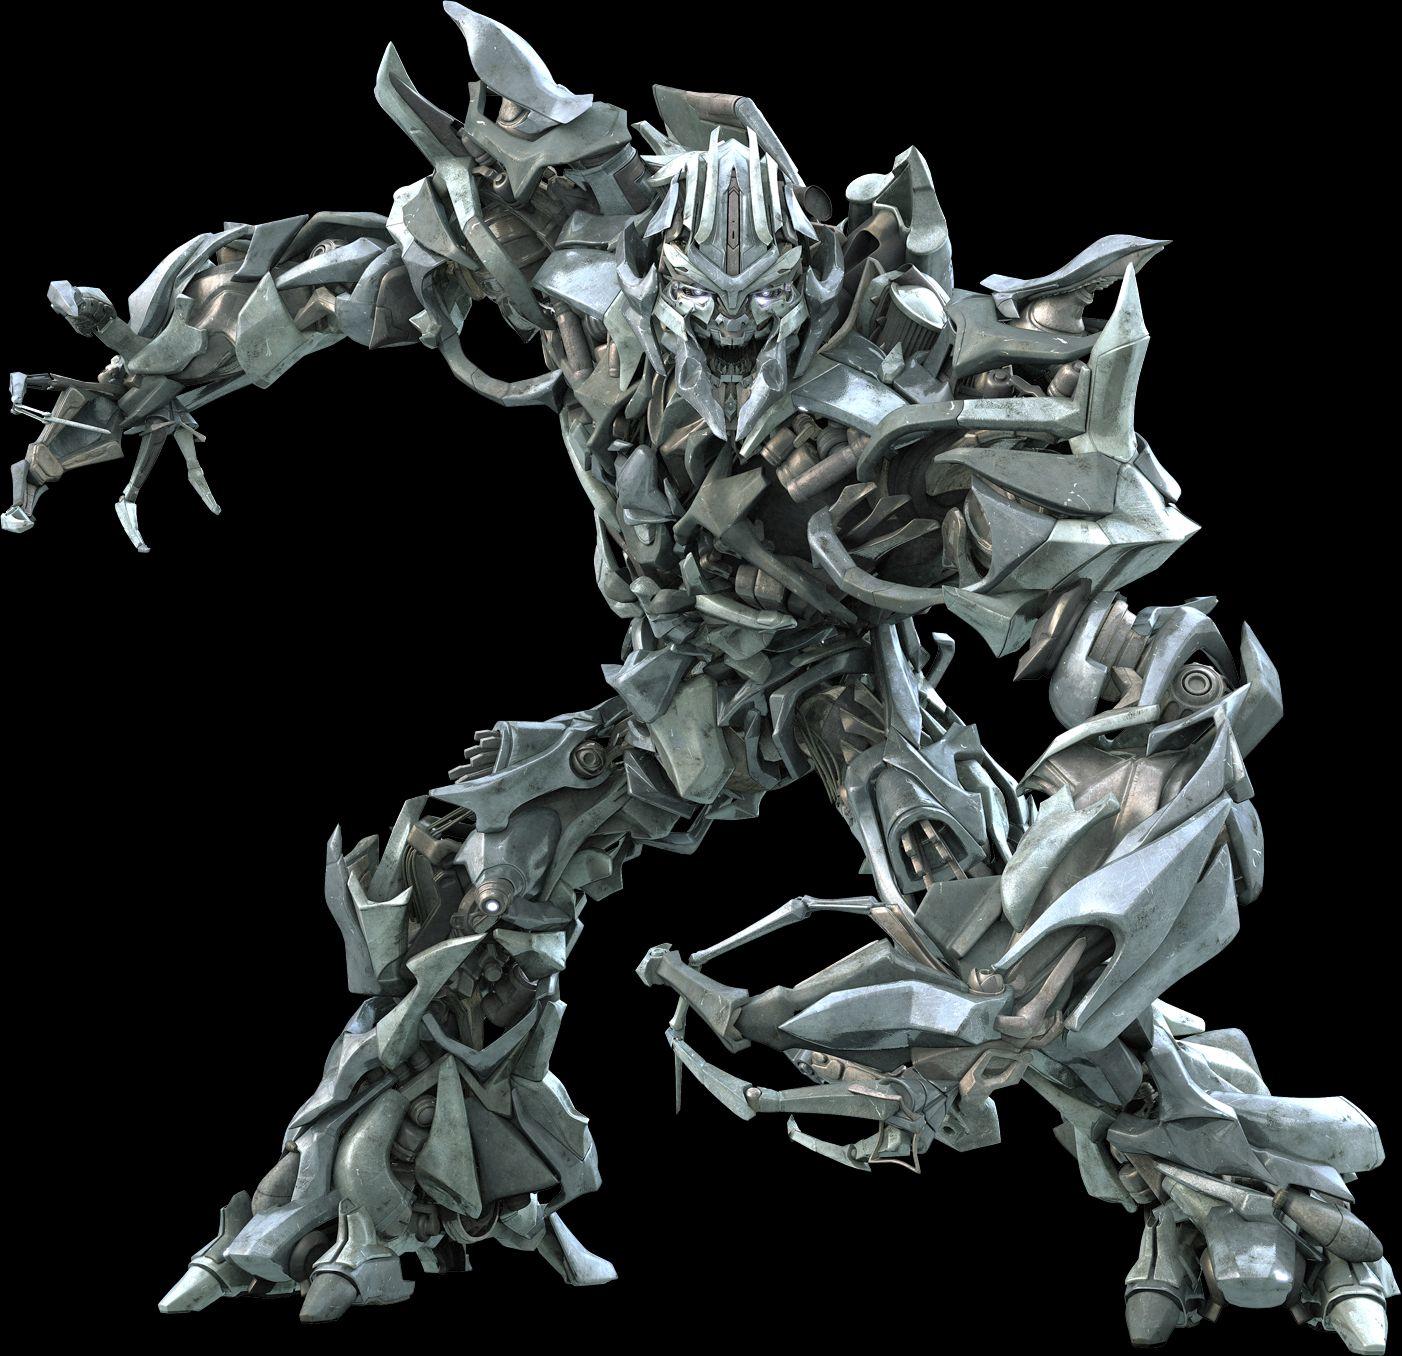 image - megatron portal | teletraan i: the transformers wiki